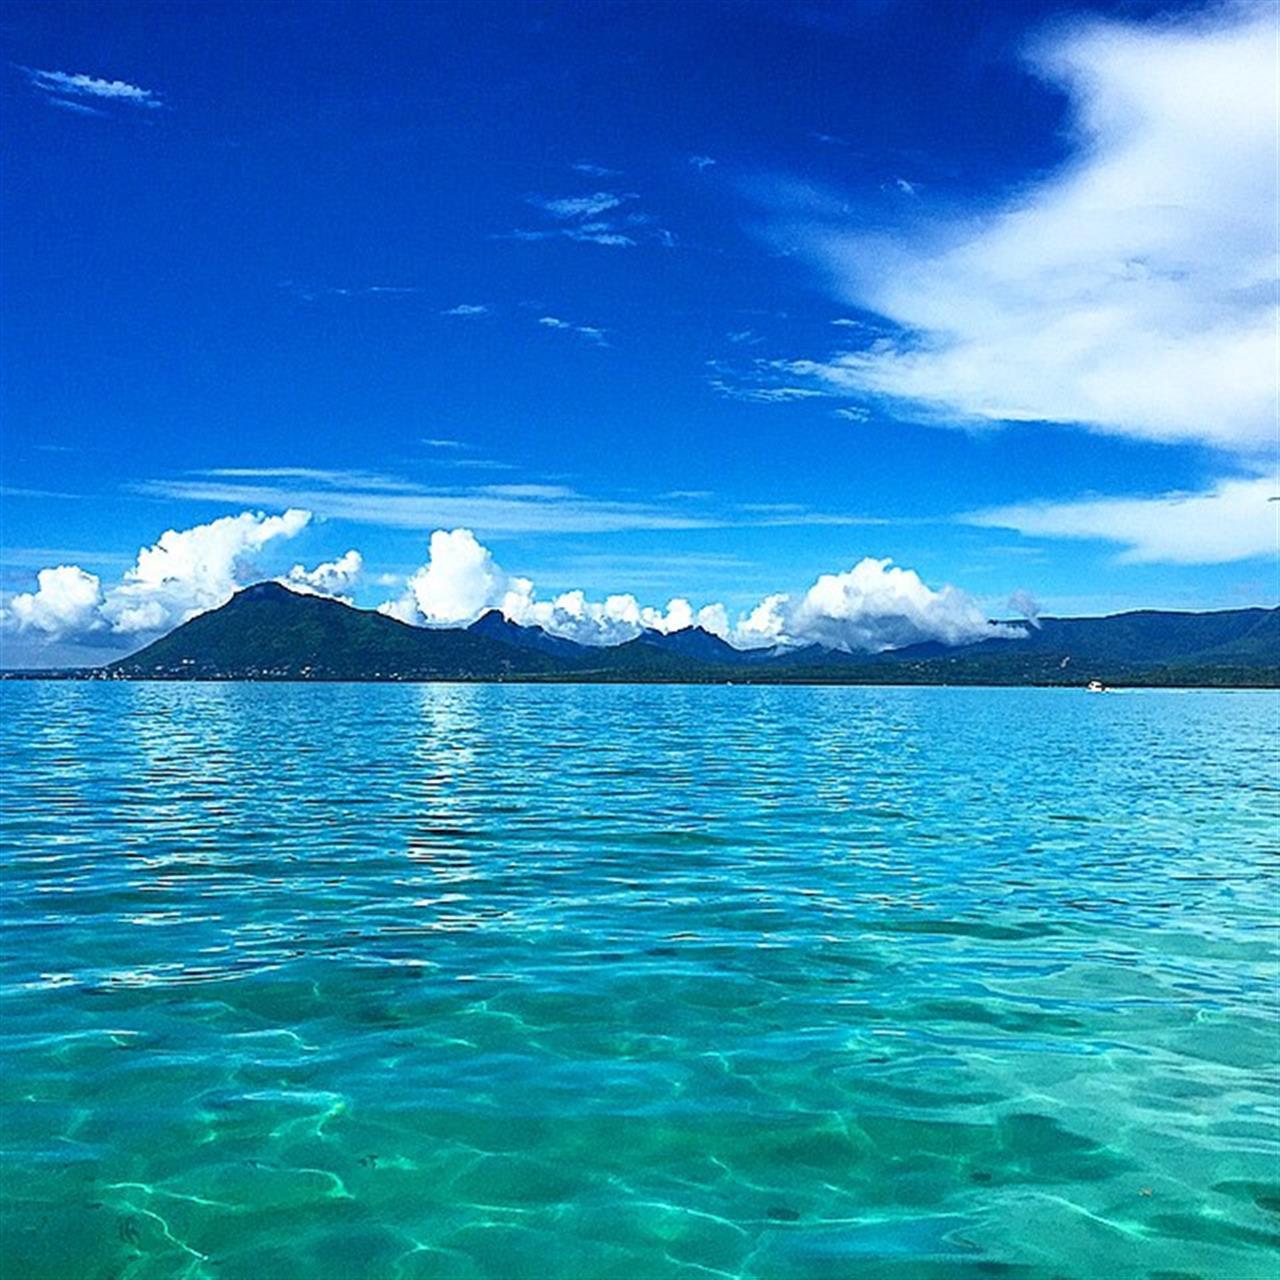 #lagoon #mauritius #LeadingRelocal #tamarin